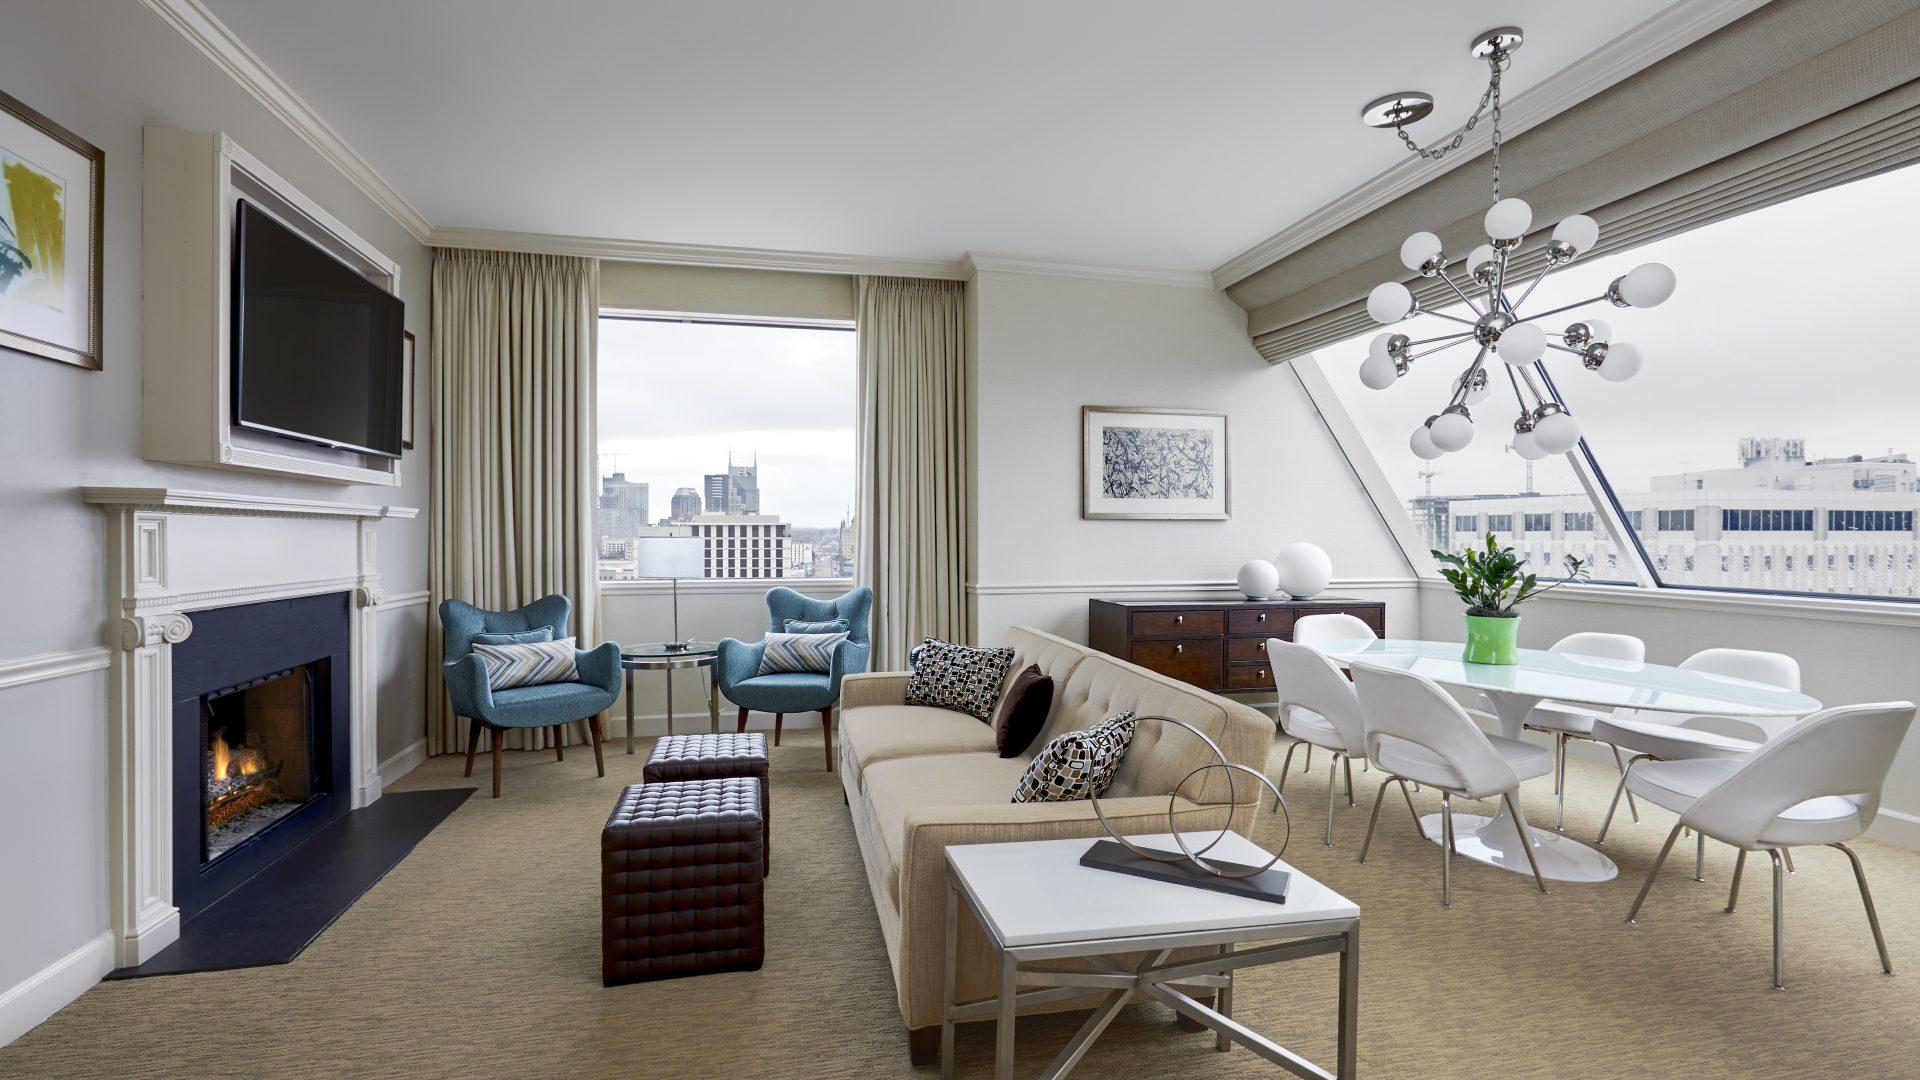 Hotels With 2 Bedroom Suites In Nashville Tn 28 Images Nashville 2 Bedroom Suites 28 Images